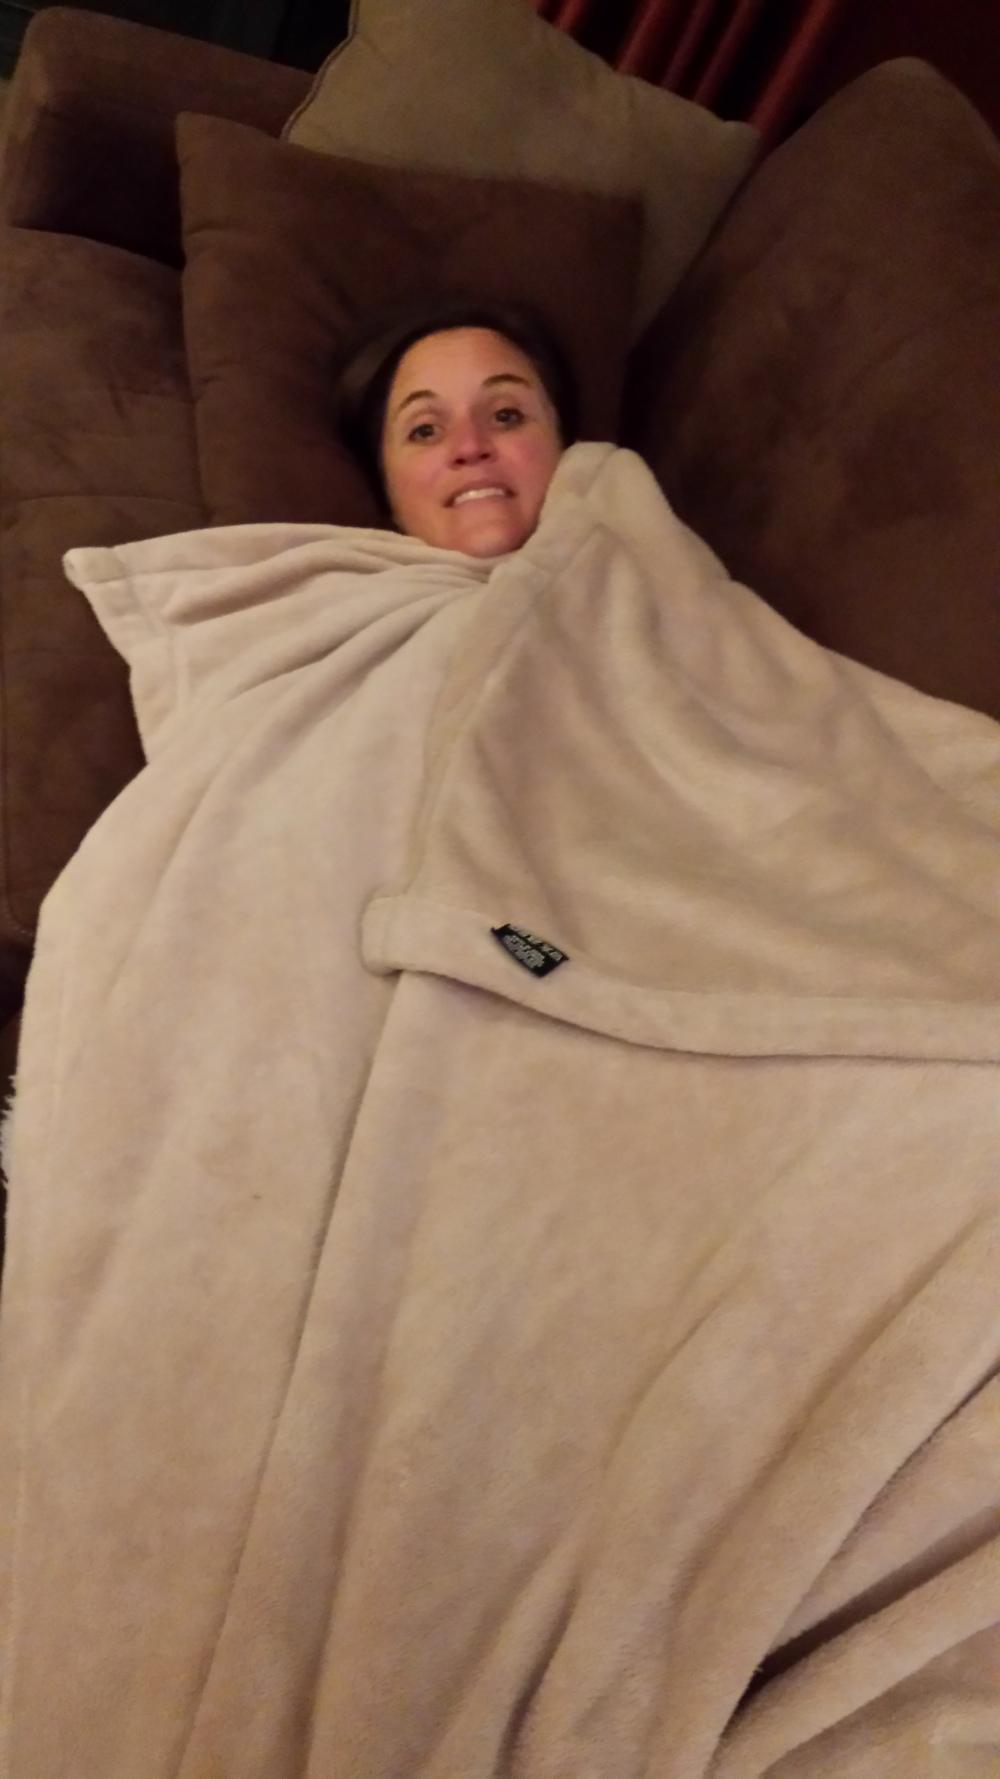 Emily Blanket Dec 2015